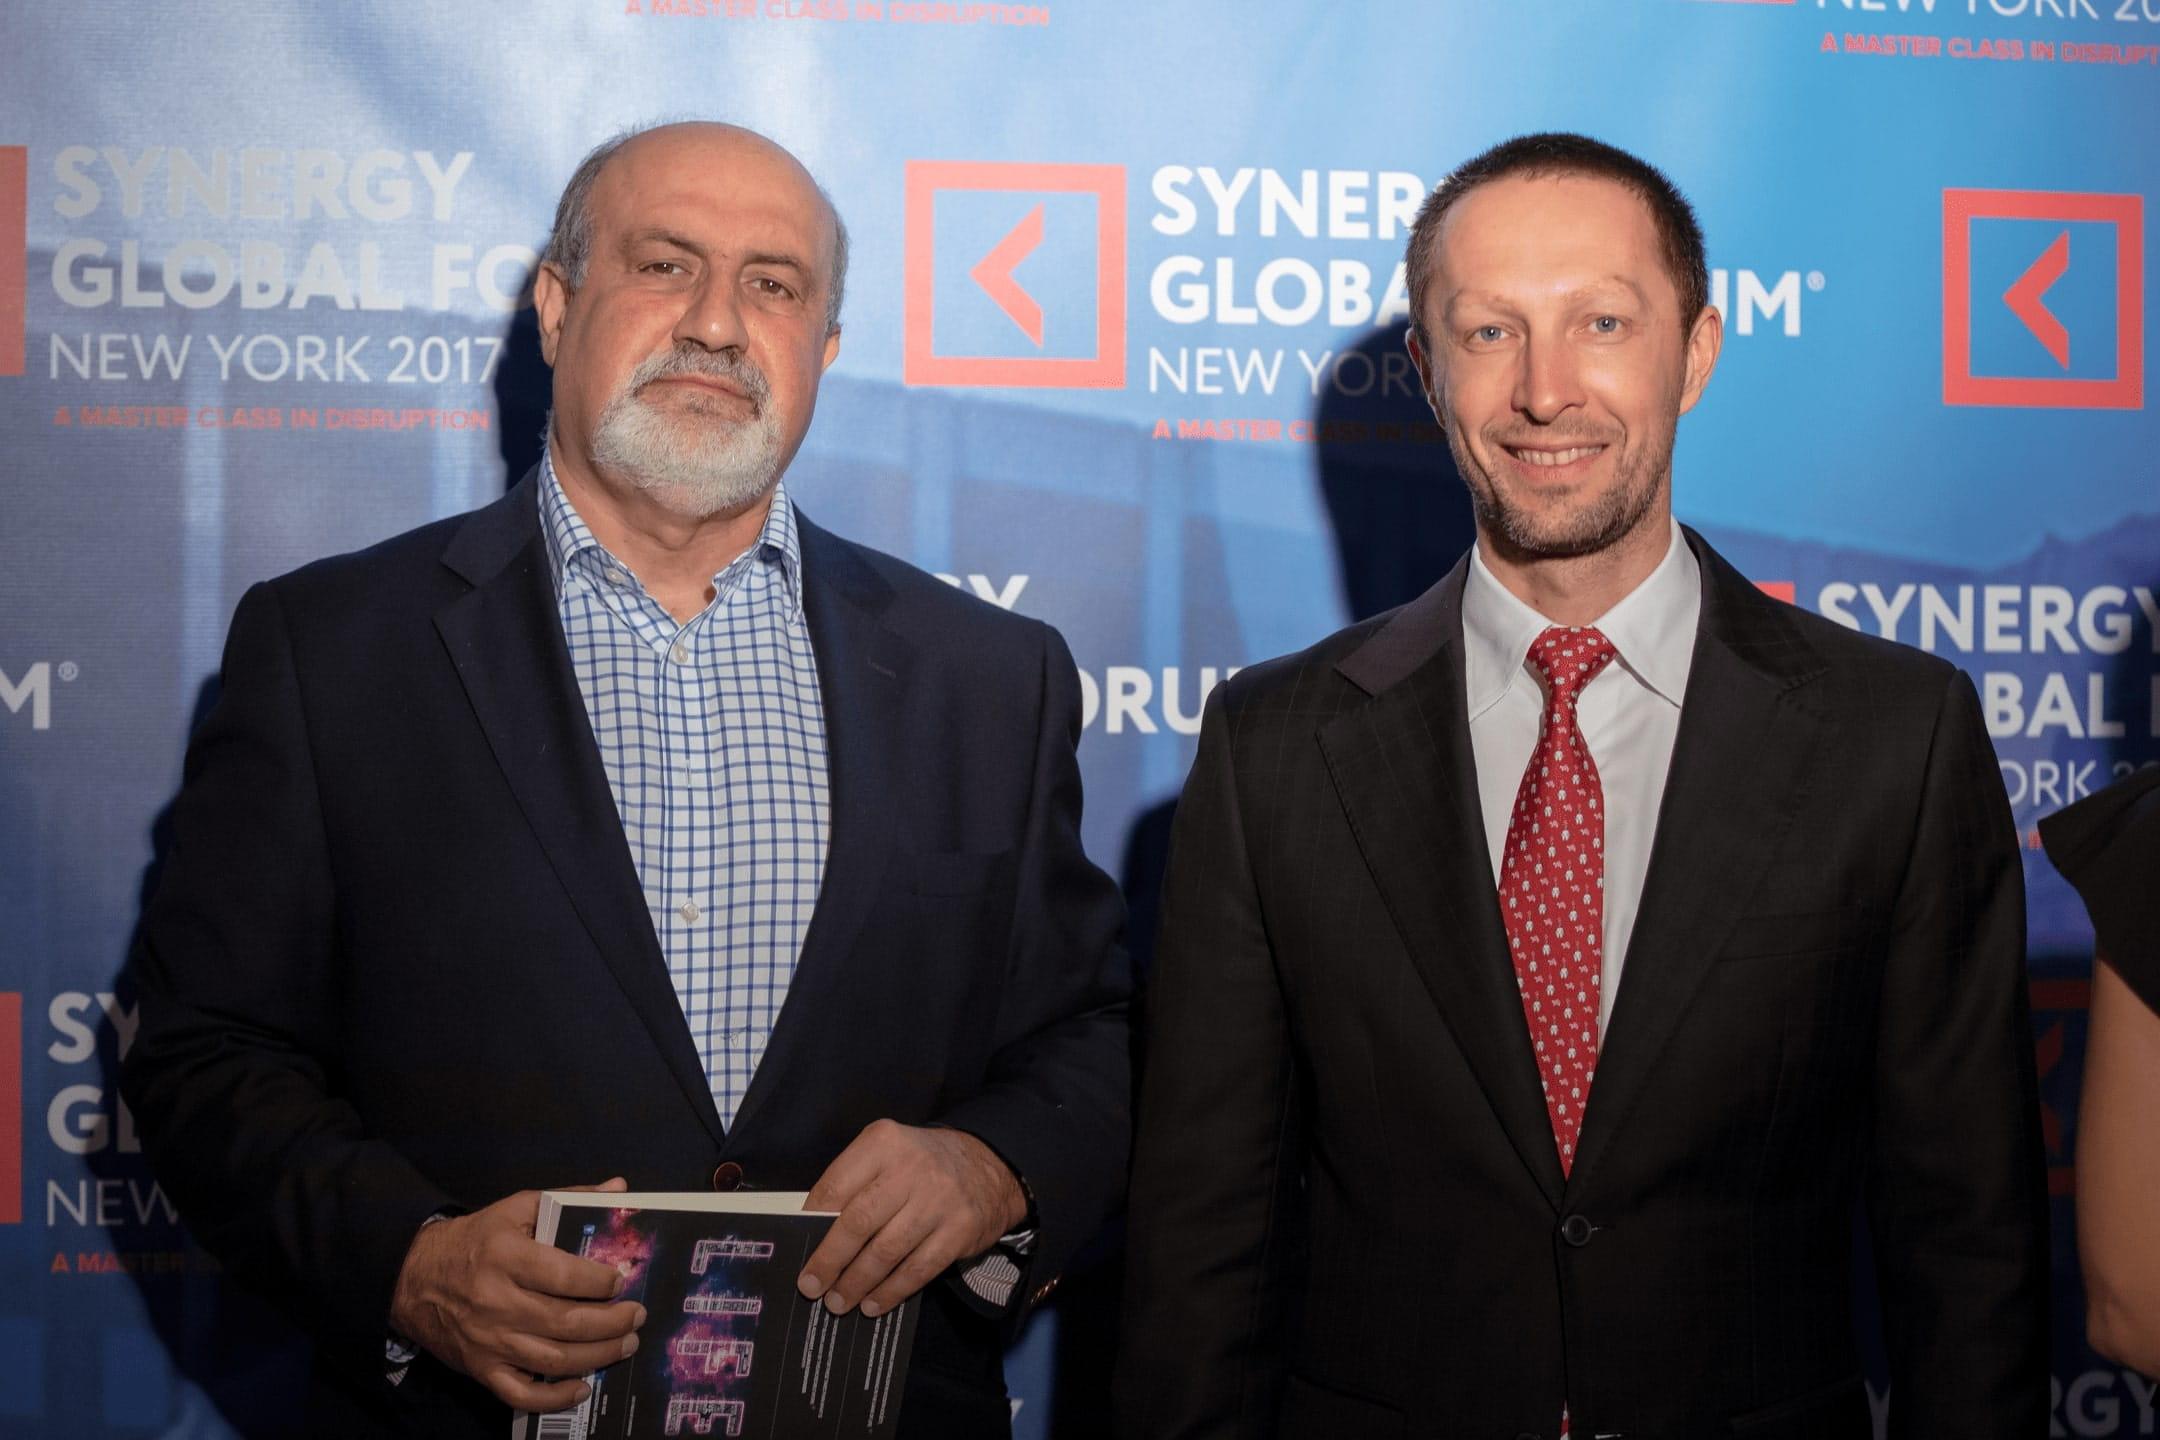 Нассим Талеб на Synergy Global Forum в Нью-Йорке